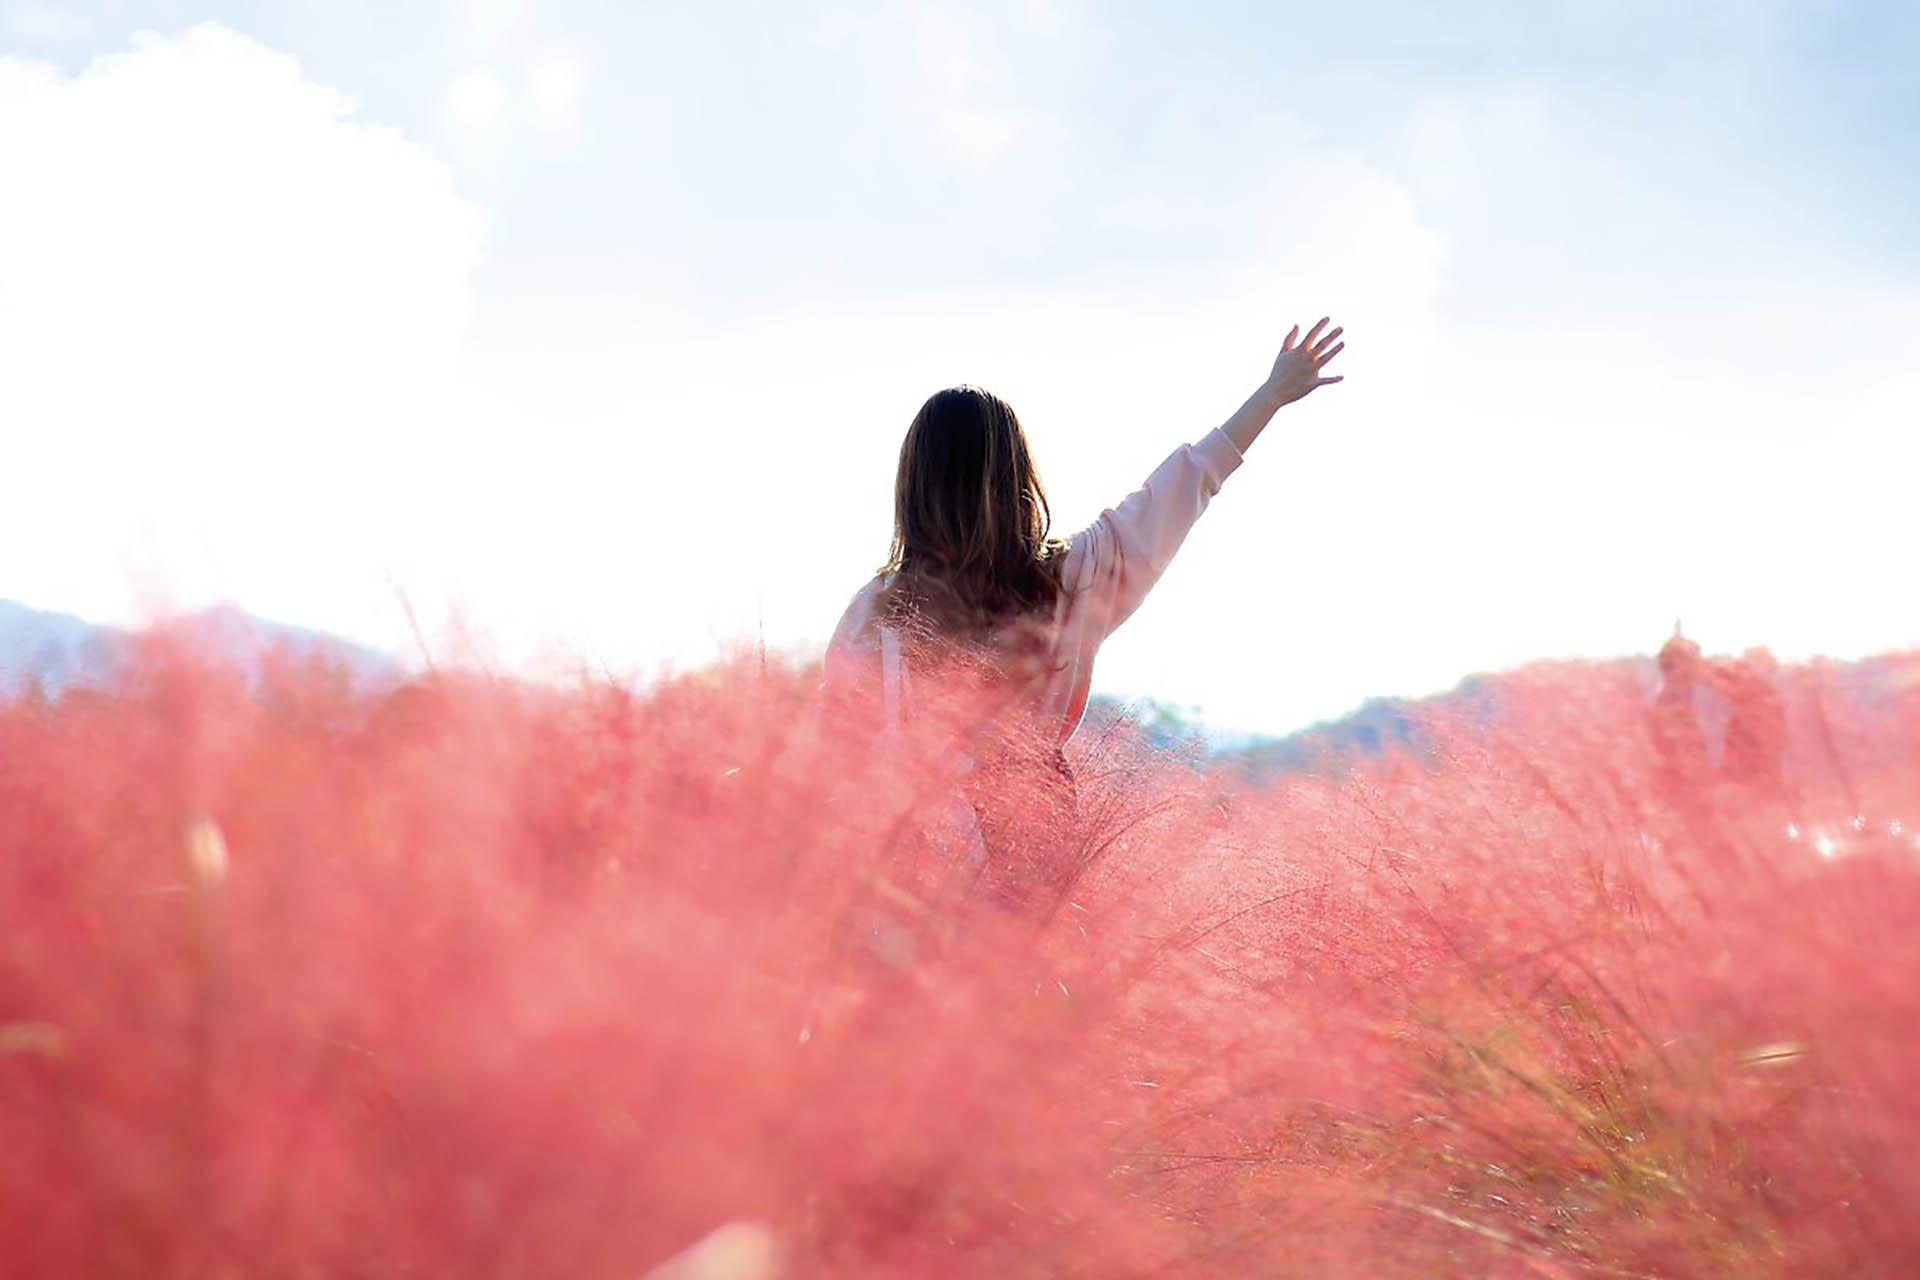 Pink-Muhly-Grass-in-Full-Bloom-at-Jamwon-Hangang-Park